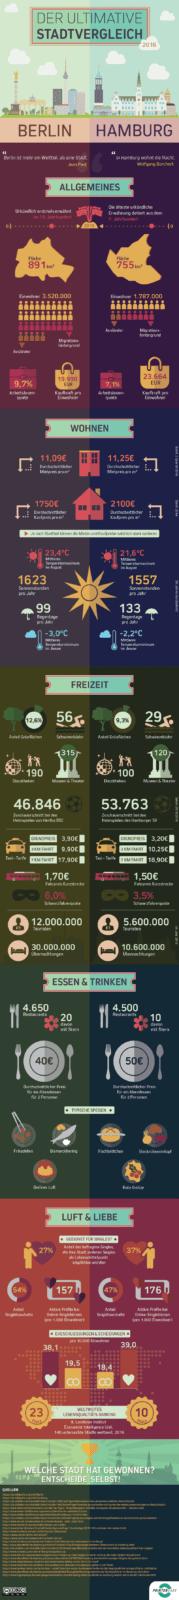 Infografik: Stadtvergleich Berlin vs Hamburg